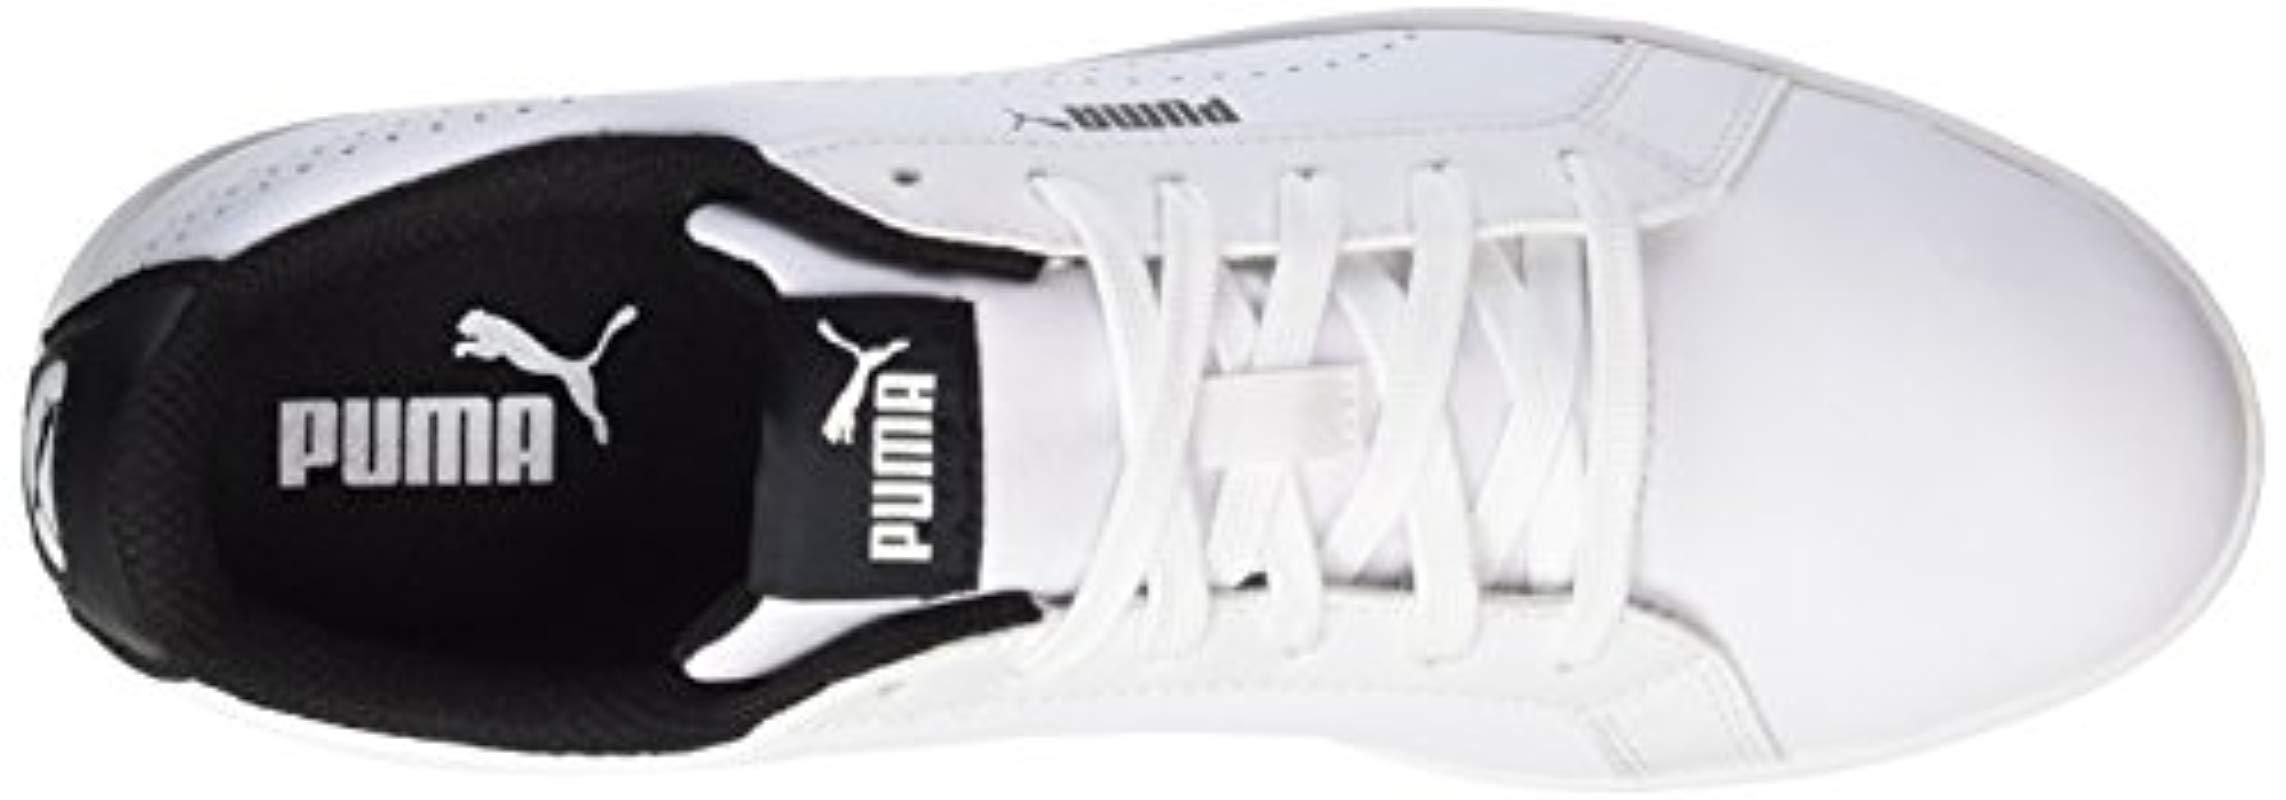 Basses Puma En Blanc PerfSneakers Lyst Femme Coloris Smash UzGqpSMV